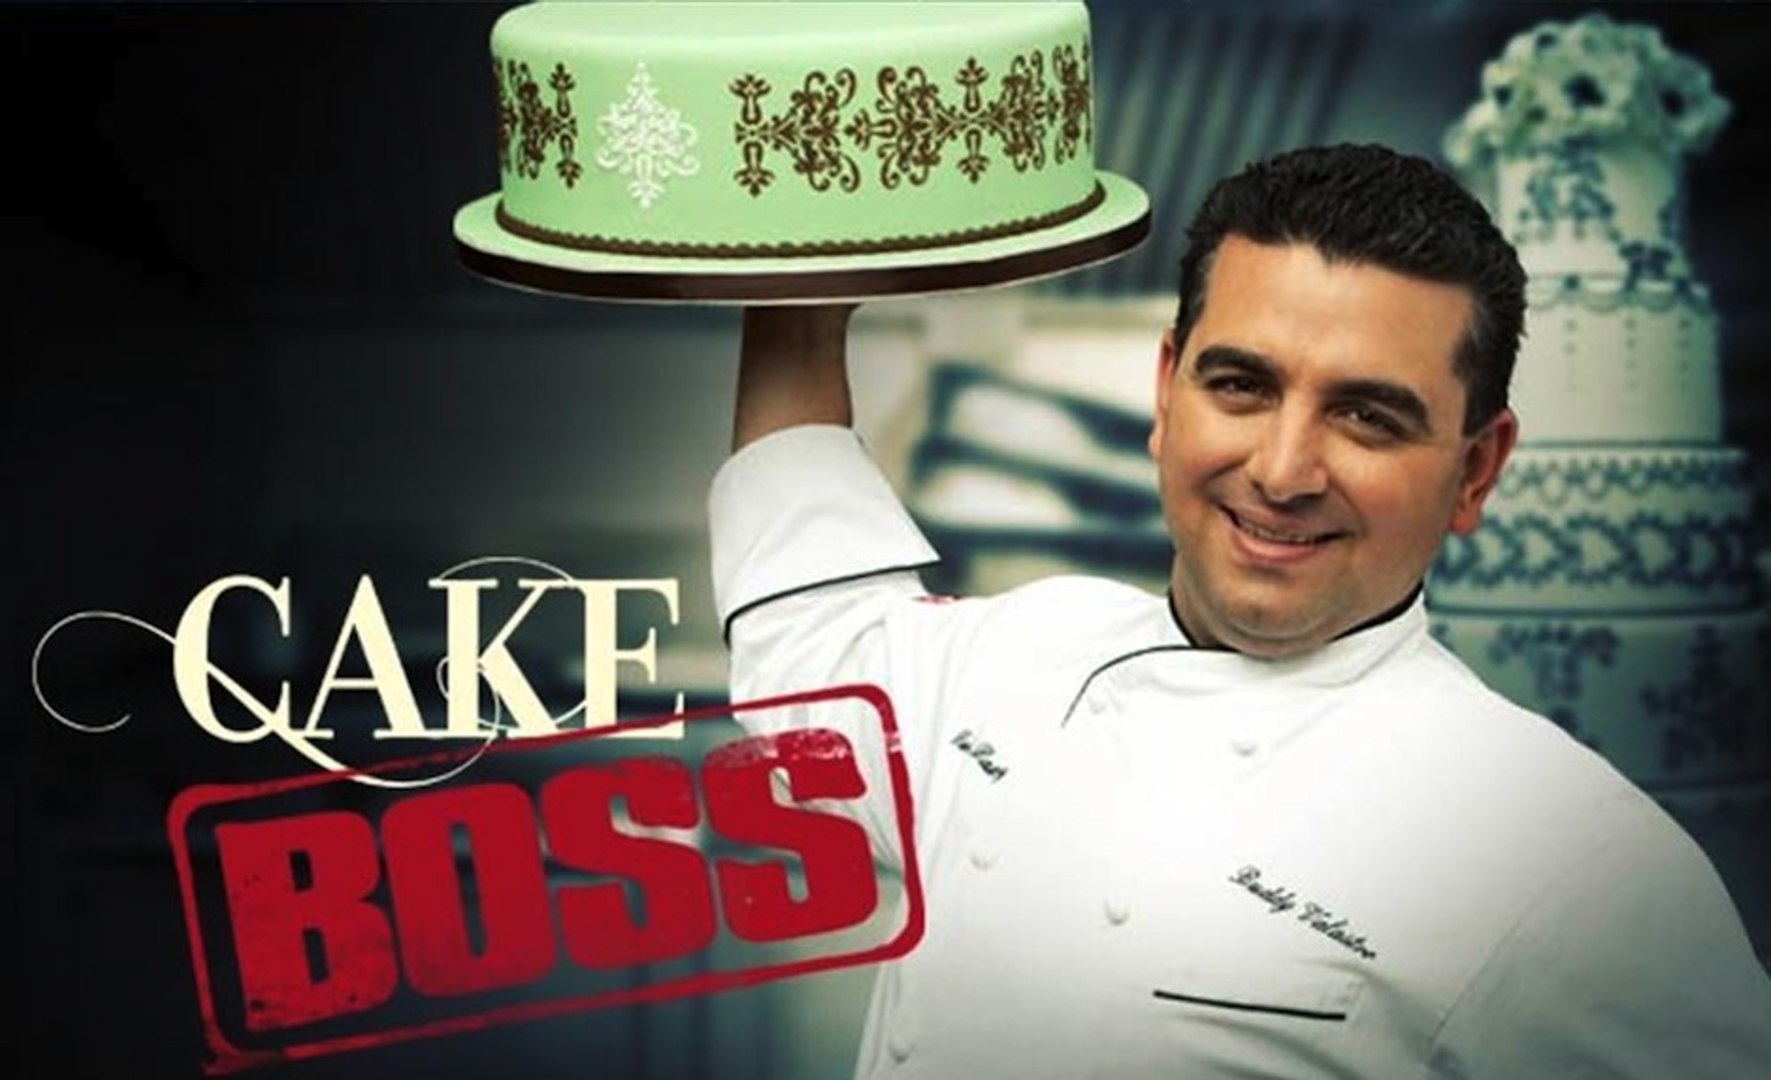 Cake Boss - Season 2 Episode 10